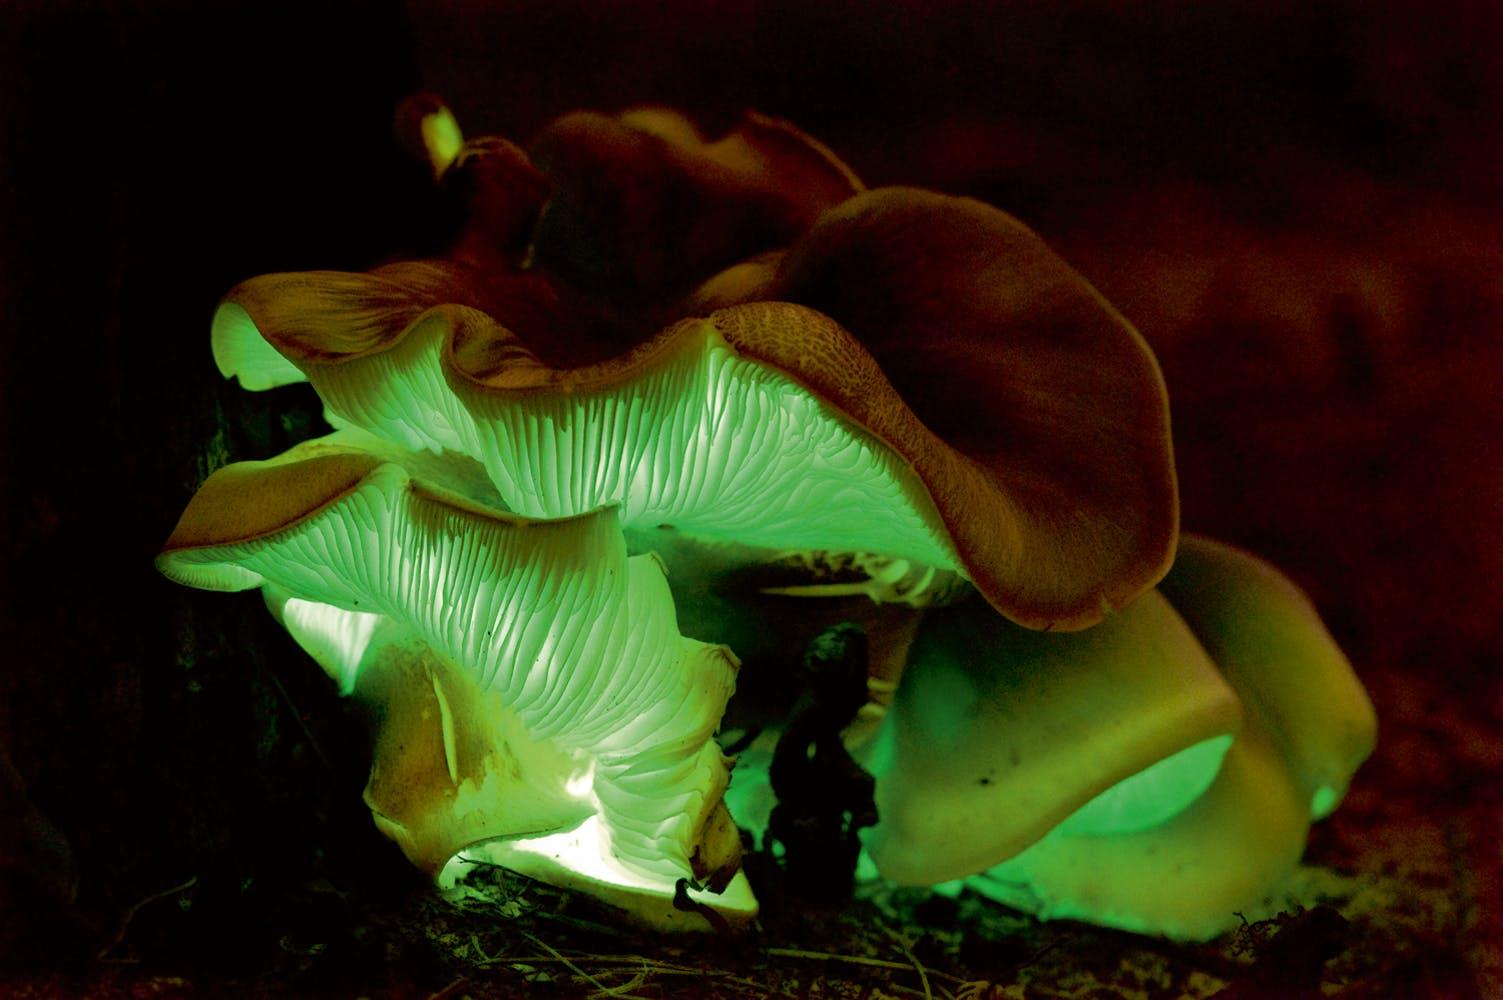 Selvlysende svampe 17/2014